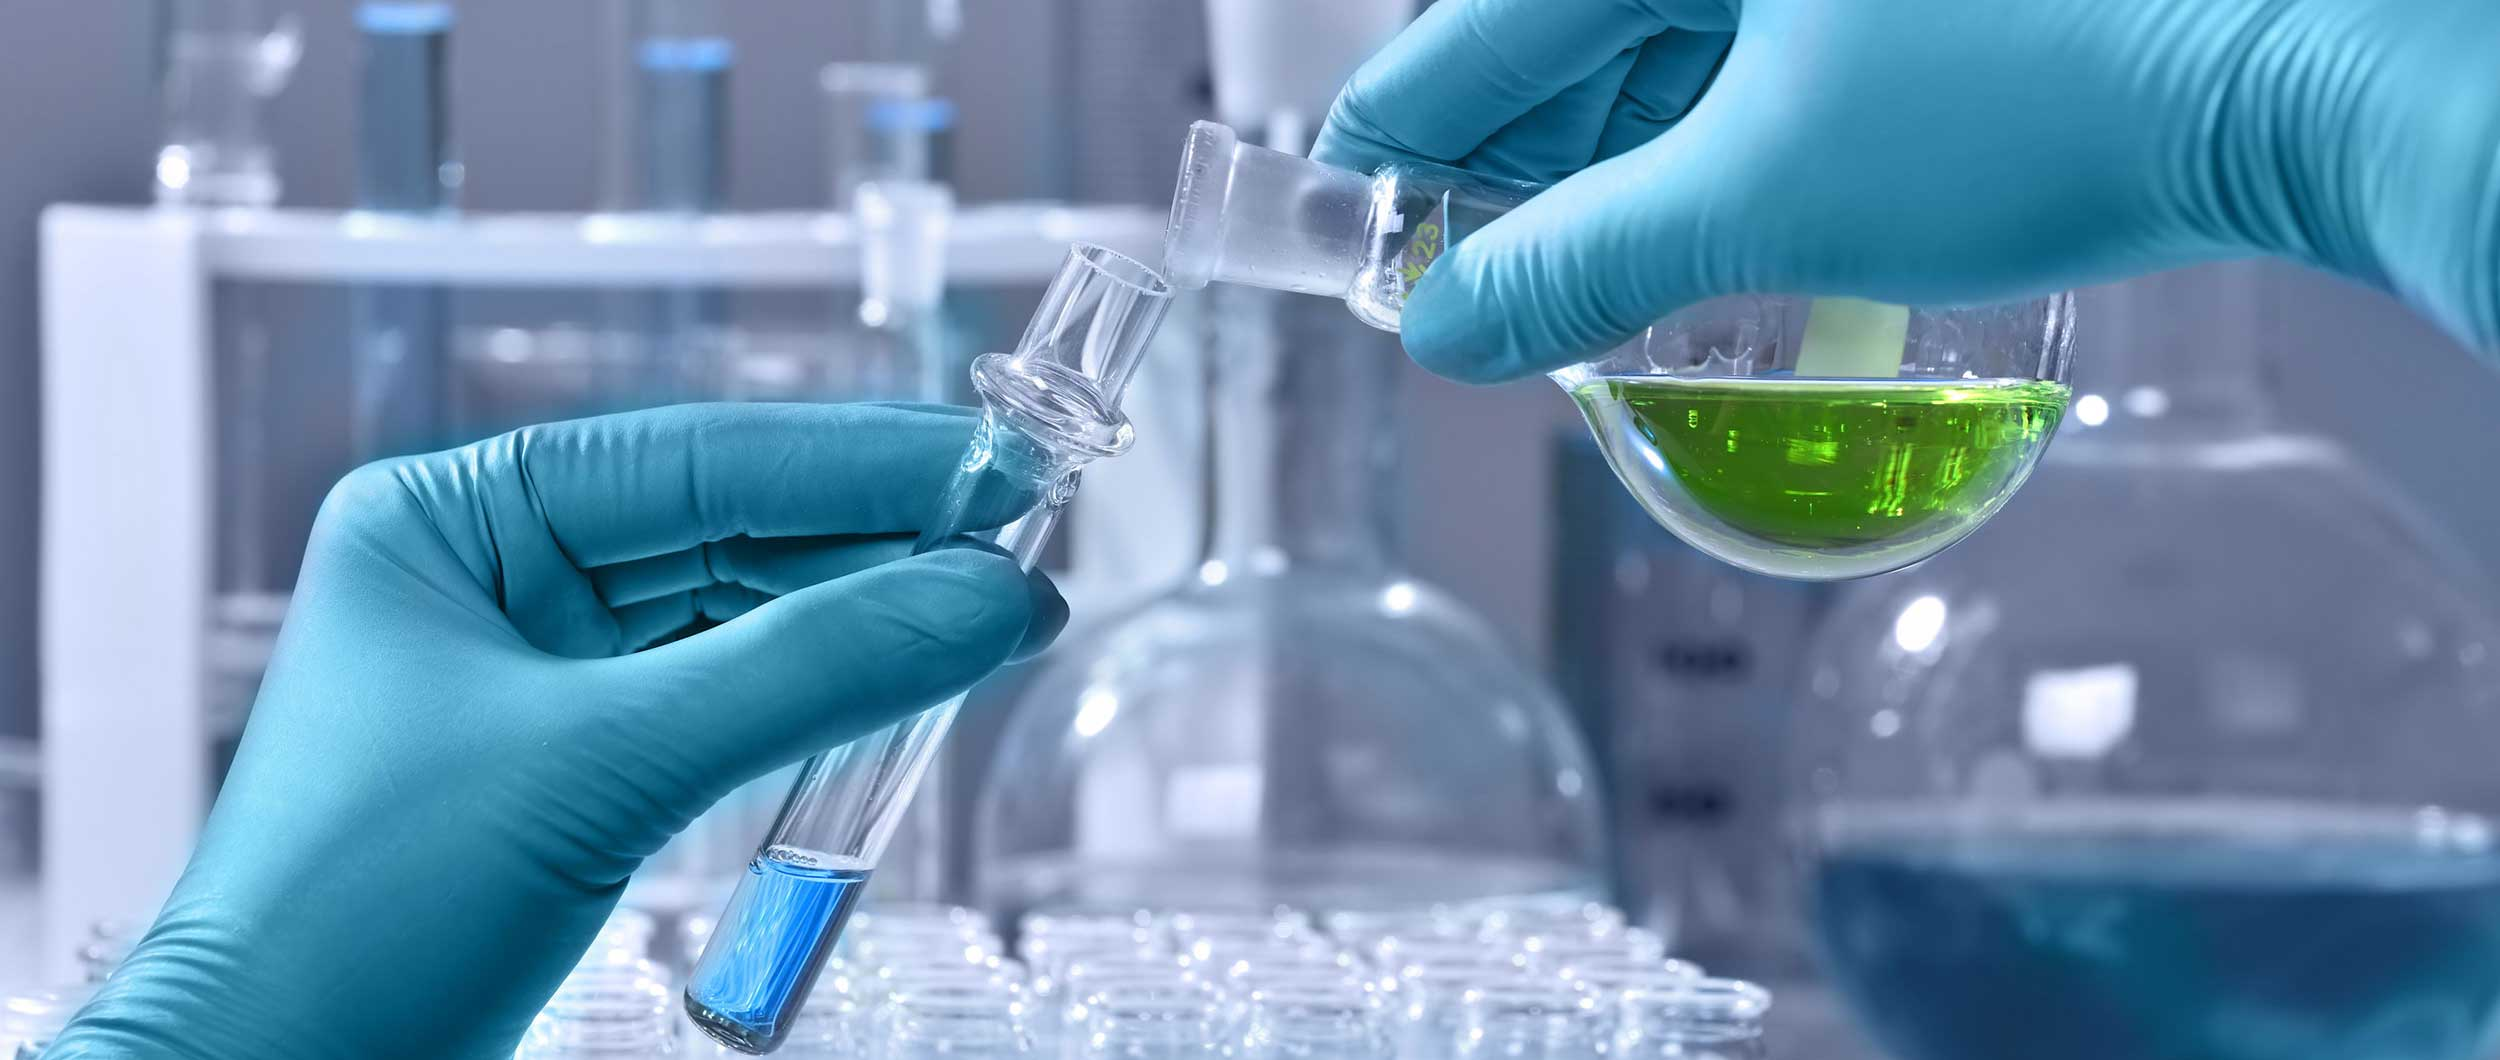 cbd oil lab tesing